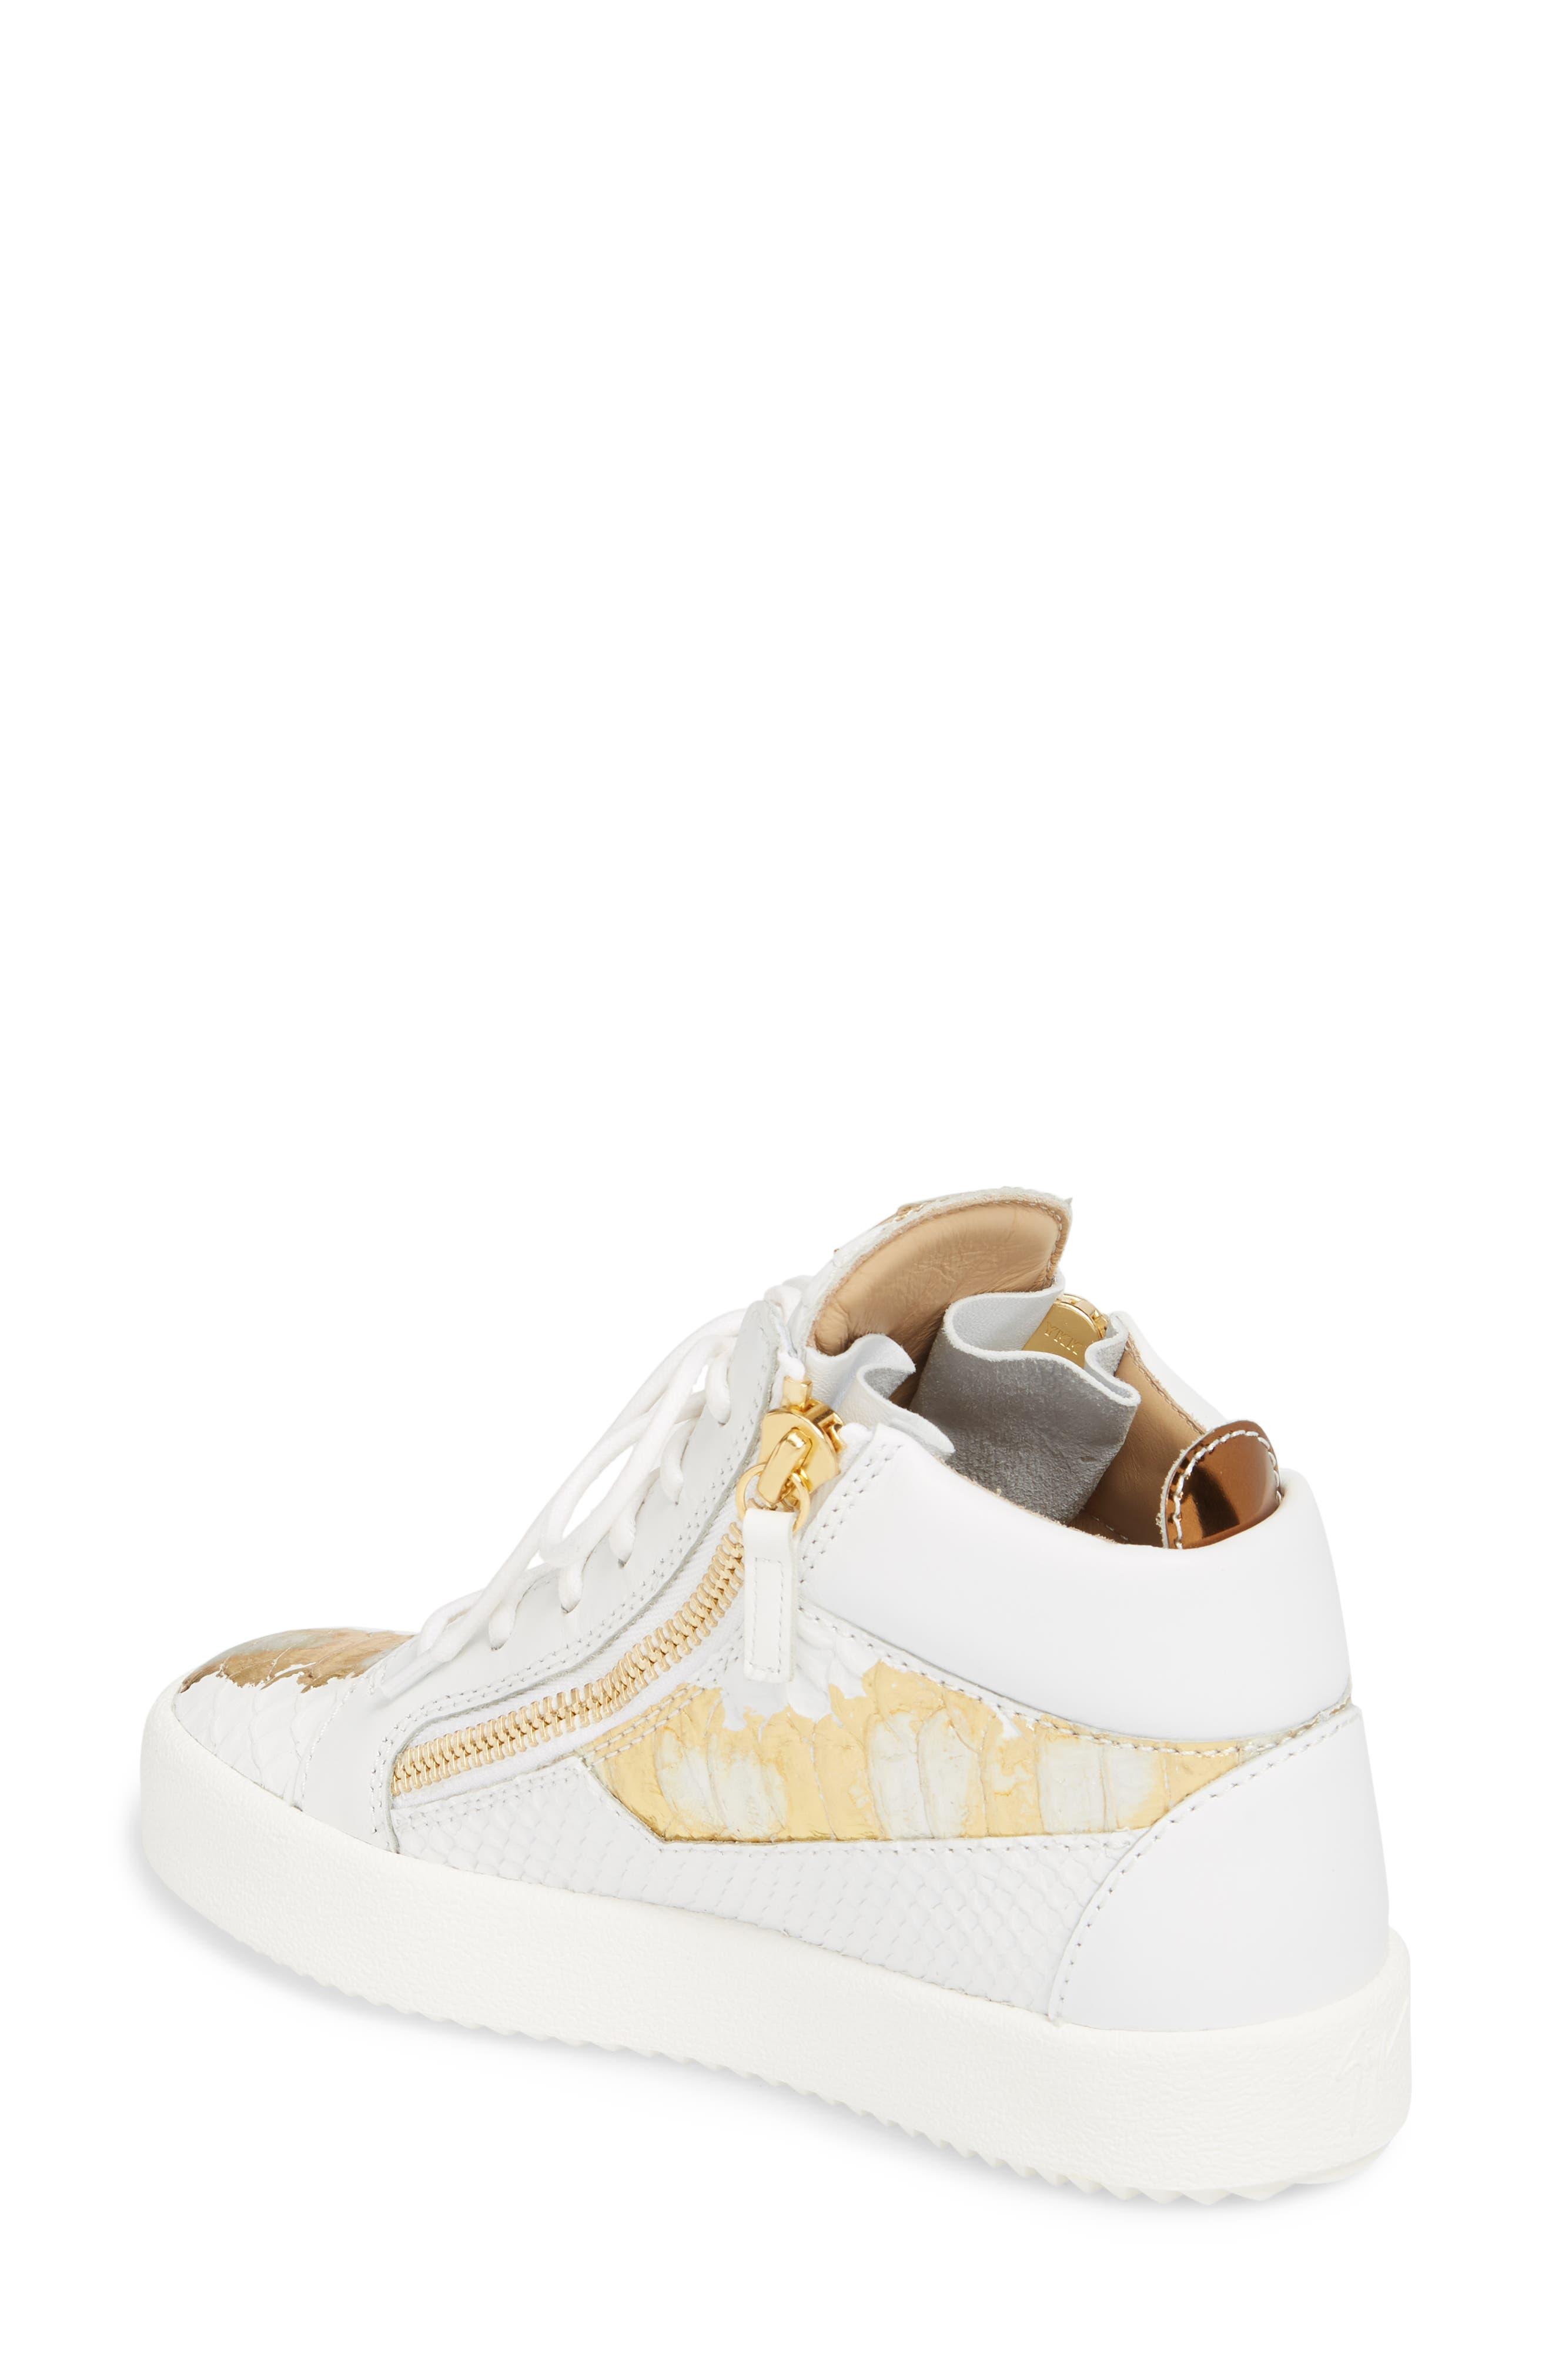 GIUSEPPE ZANOTTI, May London Mid Top Sneaker, Alternate thumbnail 2, color, WHITE/NEON YELLOW